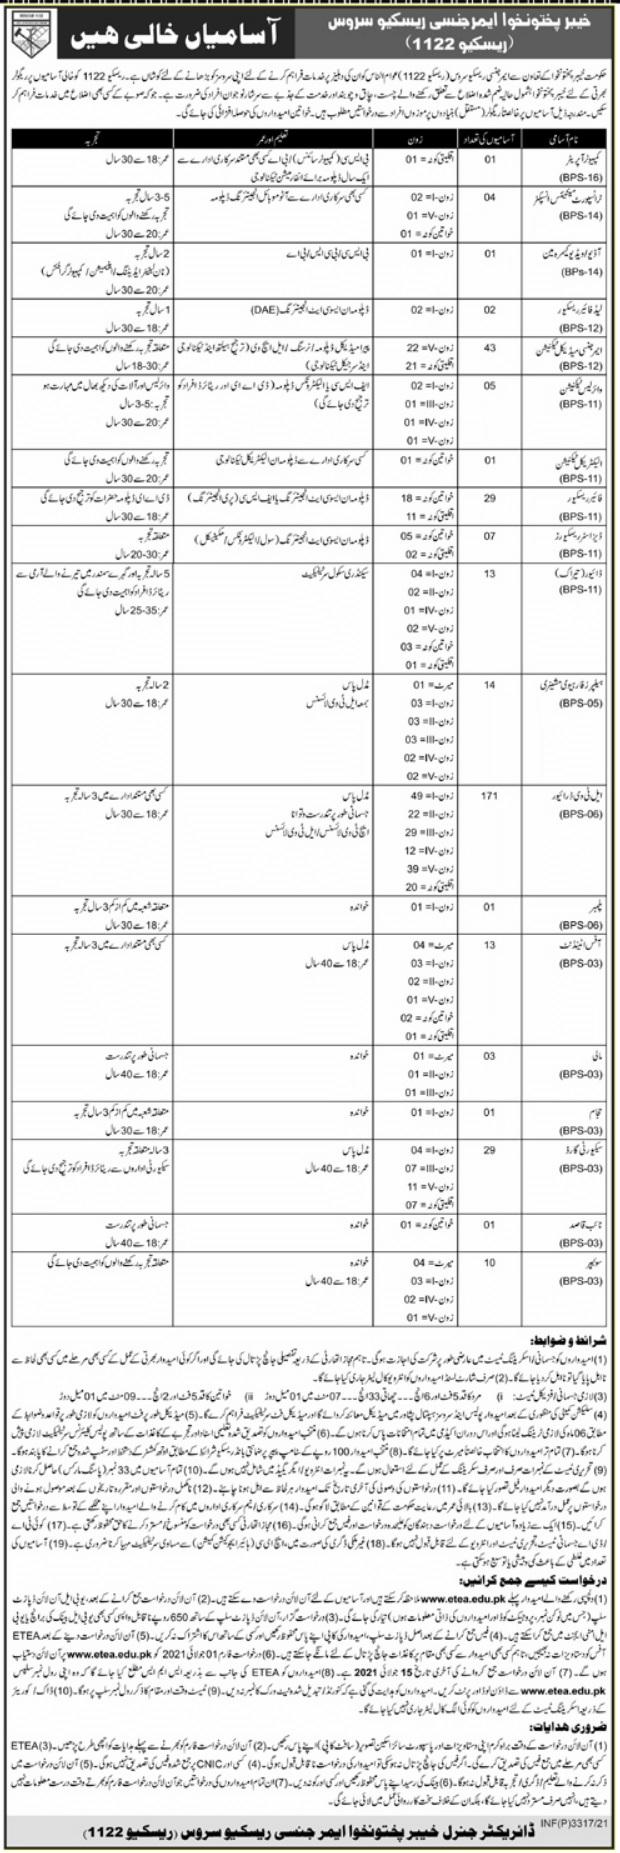 Rescue 1122 KPK Jobs Today Govt jobs in Peshawar today